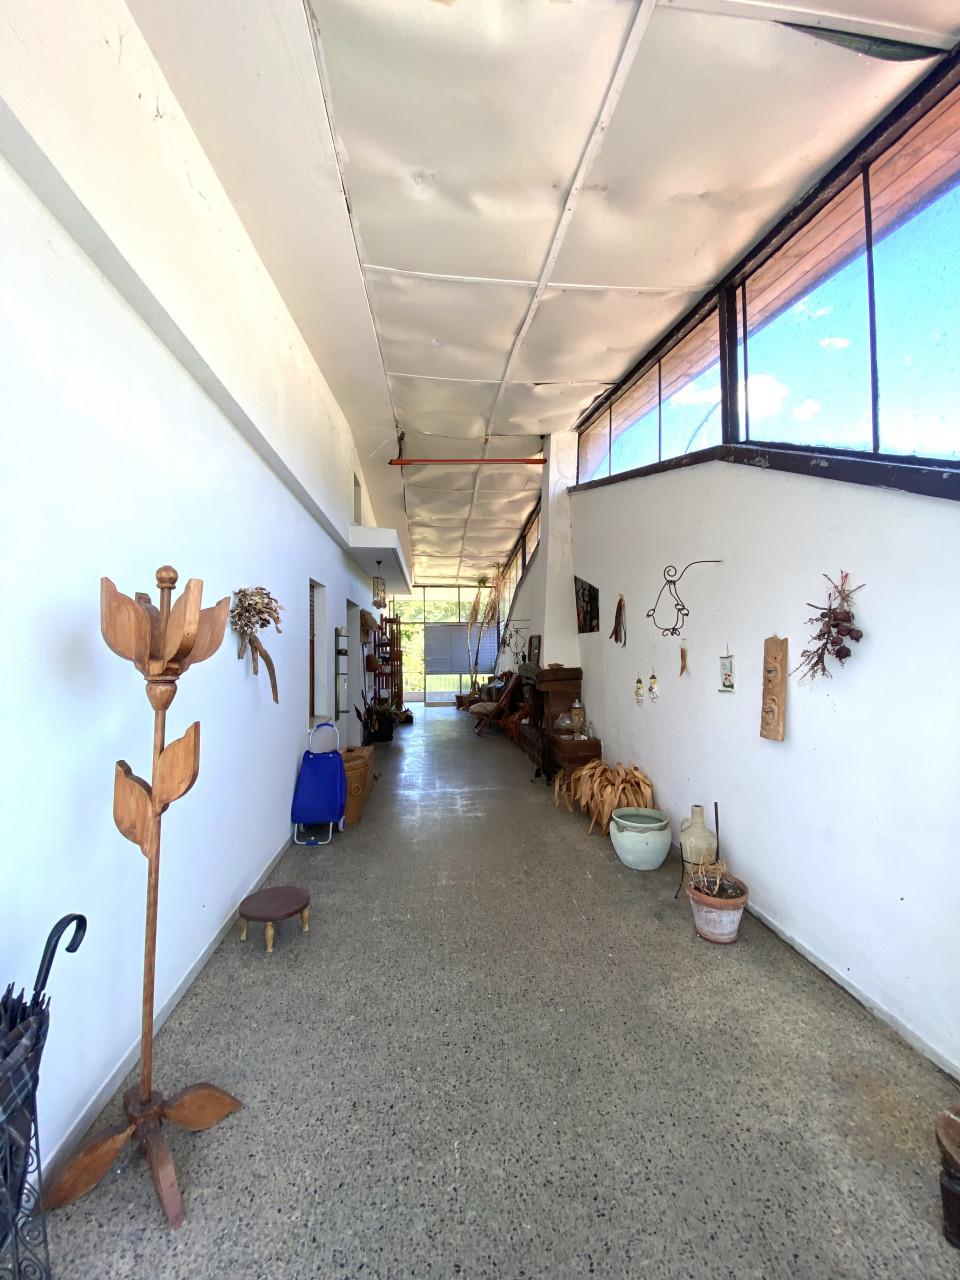 Casa singola con capannone in vendita in centro a Budoia - Rif. V.D.1 https://images.gestionaleimmobiliare.it/foto/annunci/200702/2265893/1280x1280/013__img_2971.jpg